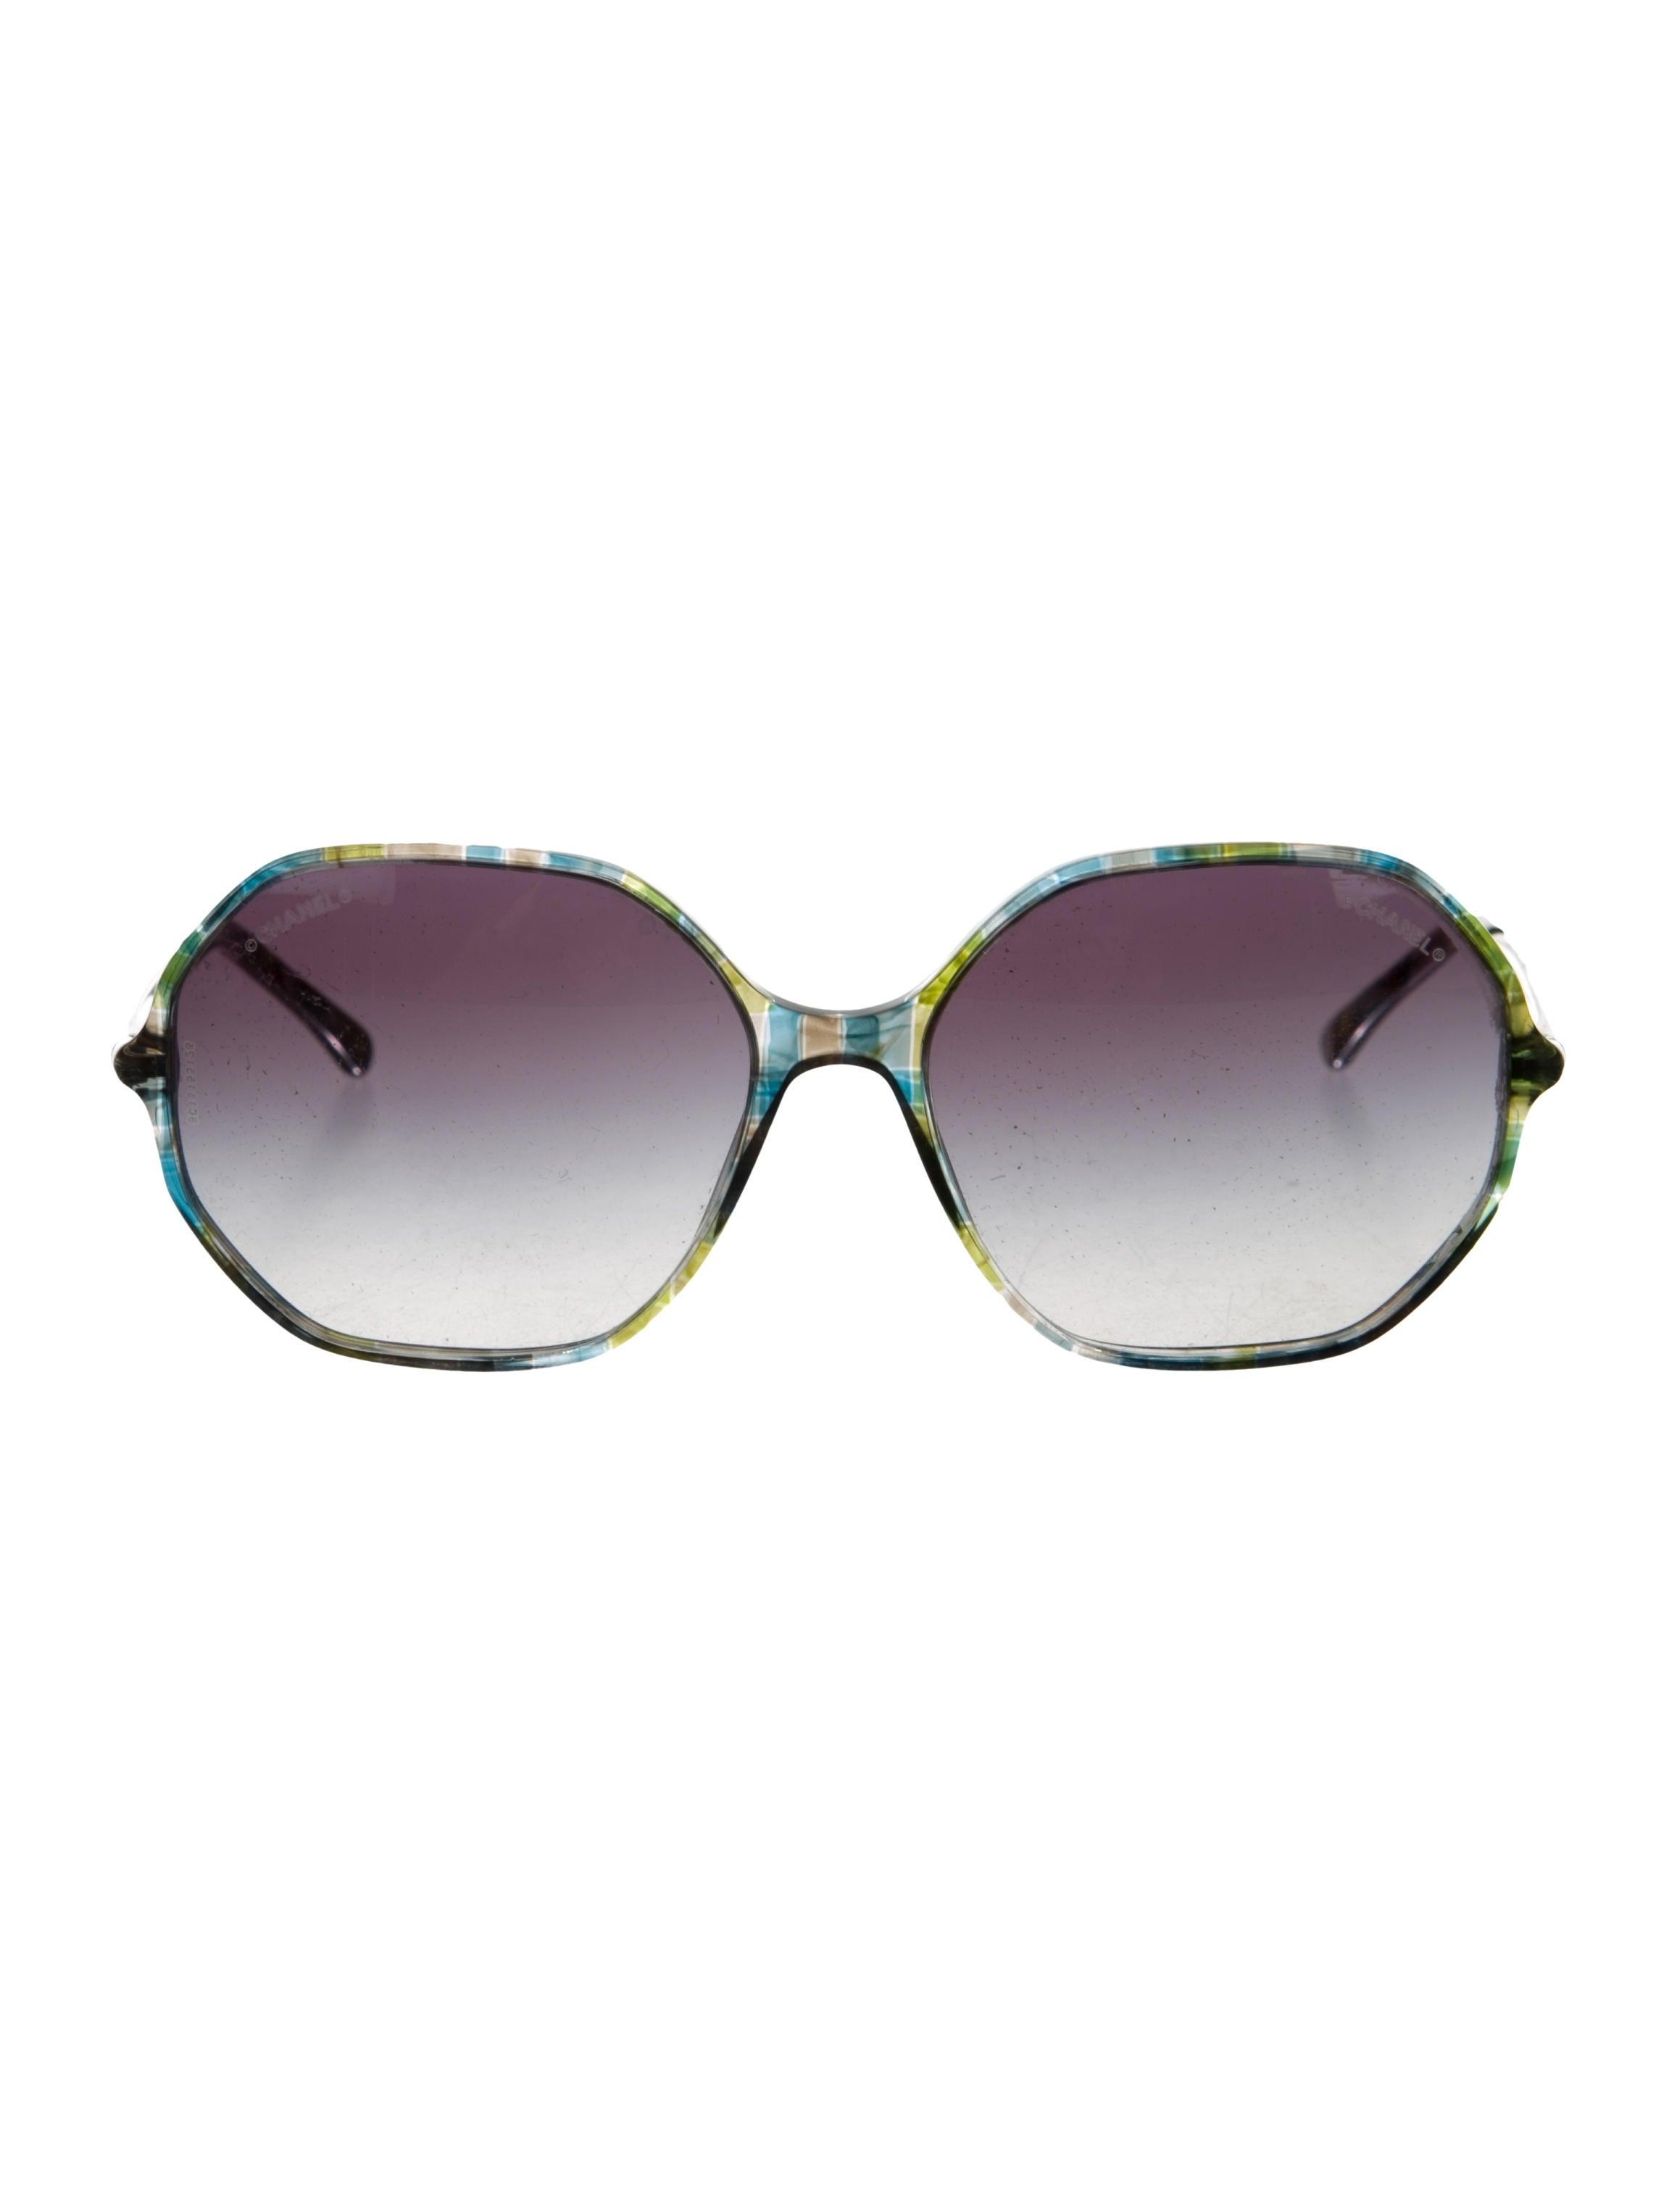 Chanel Round Spring Sunglasses - Accessories